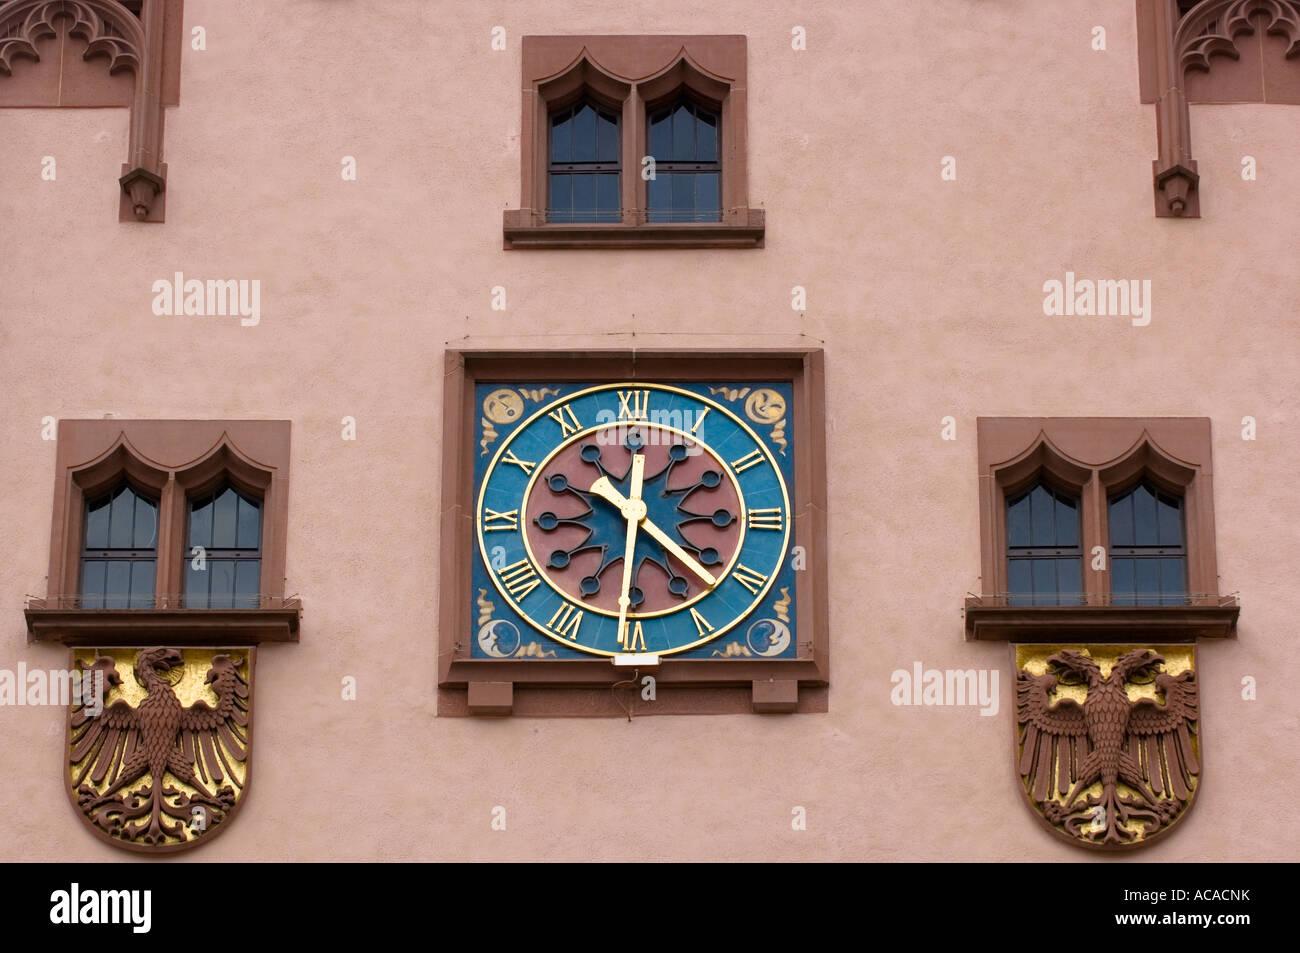 Roemer, cityhall clock, Frankfurt am Main, Hesse, Germany Stock Photo